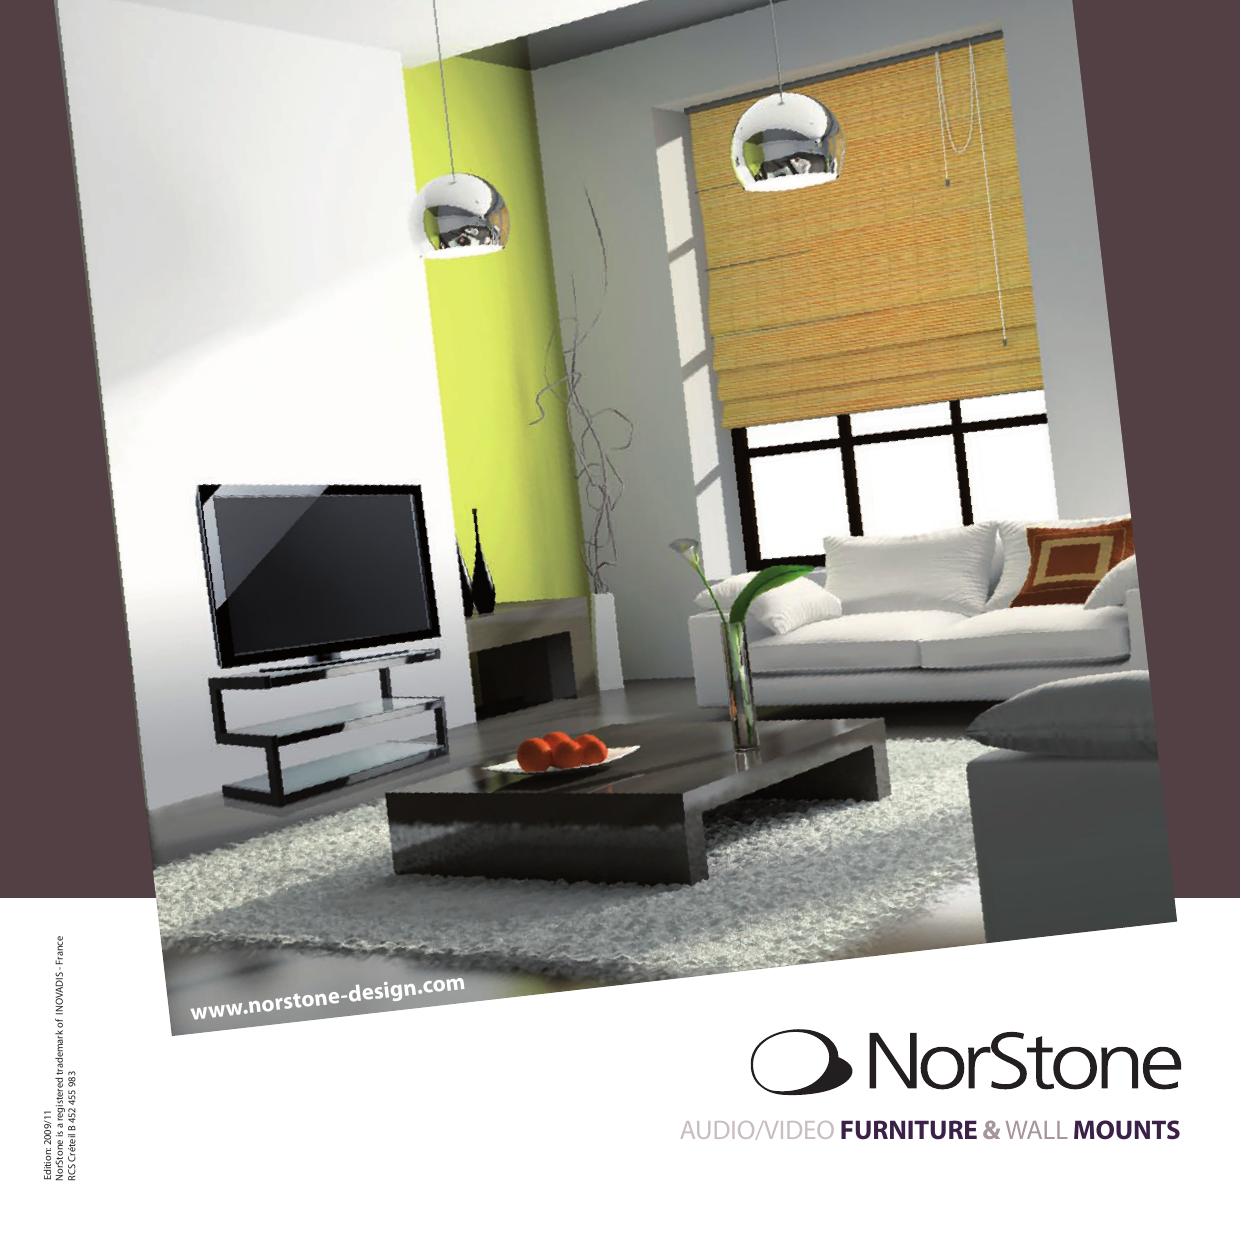 Norstone Design Eker 3.Norstone 2009 2010 Brochure Manualzz Com